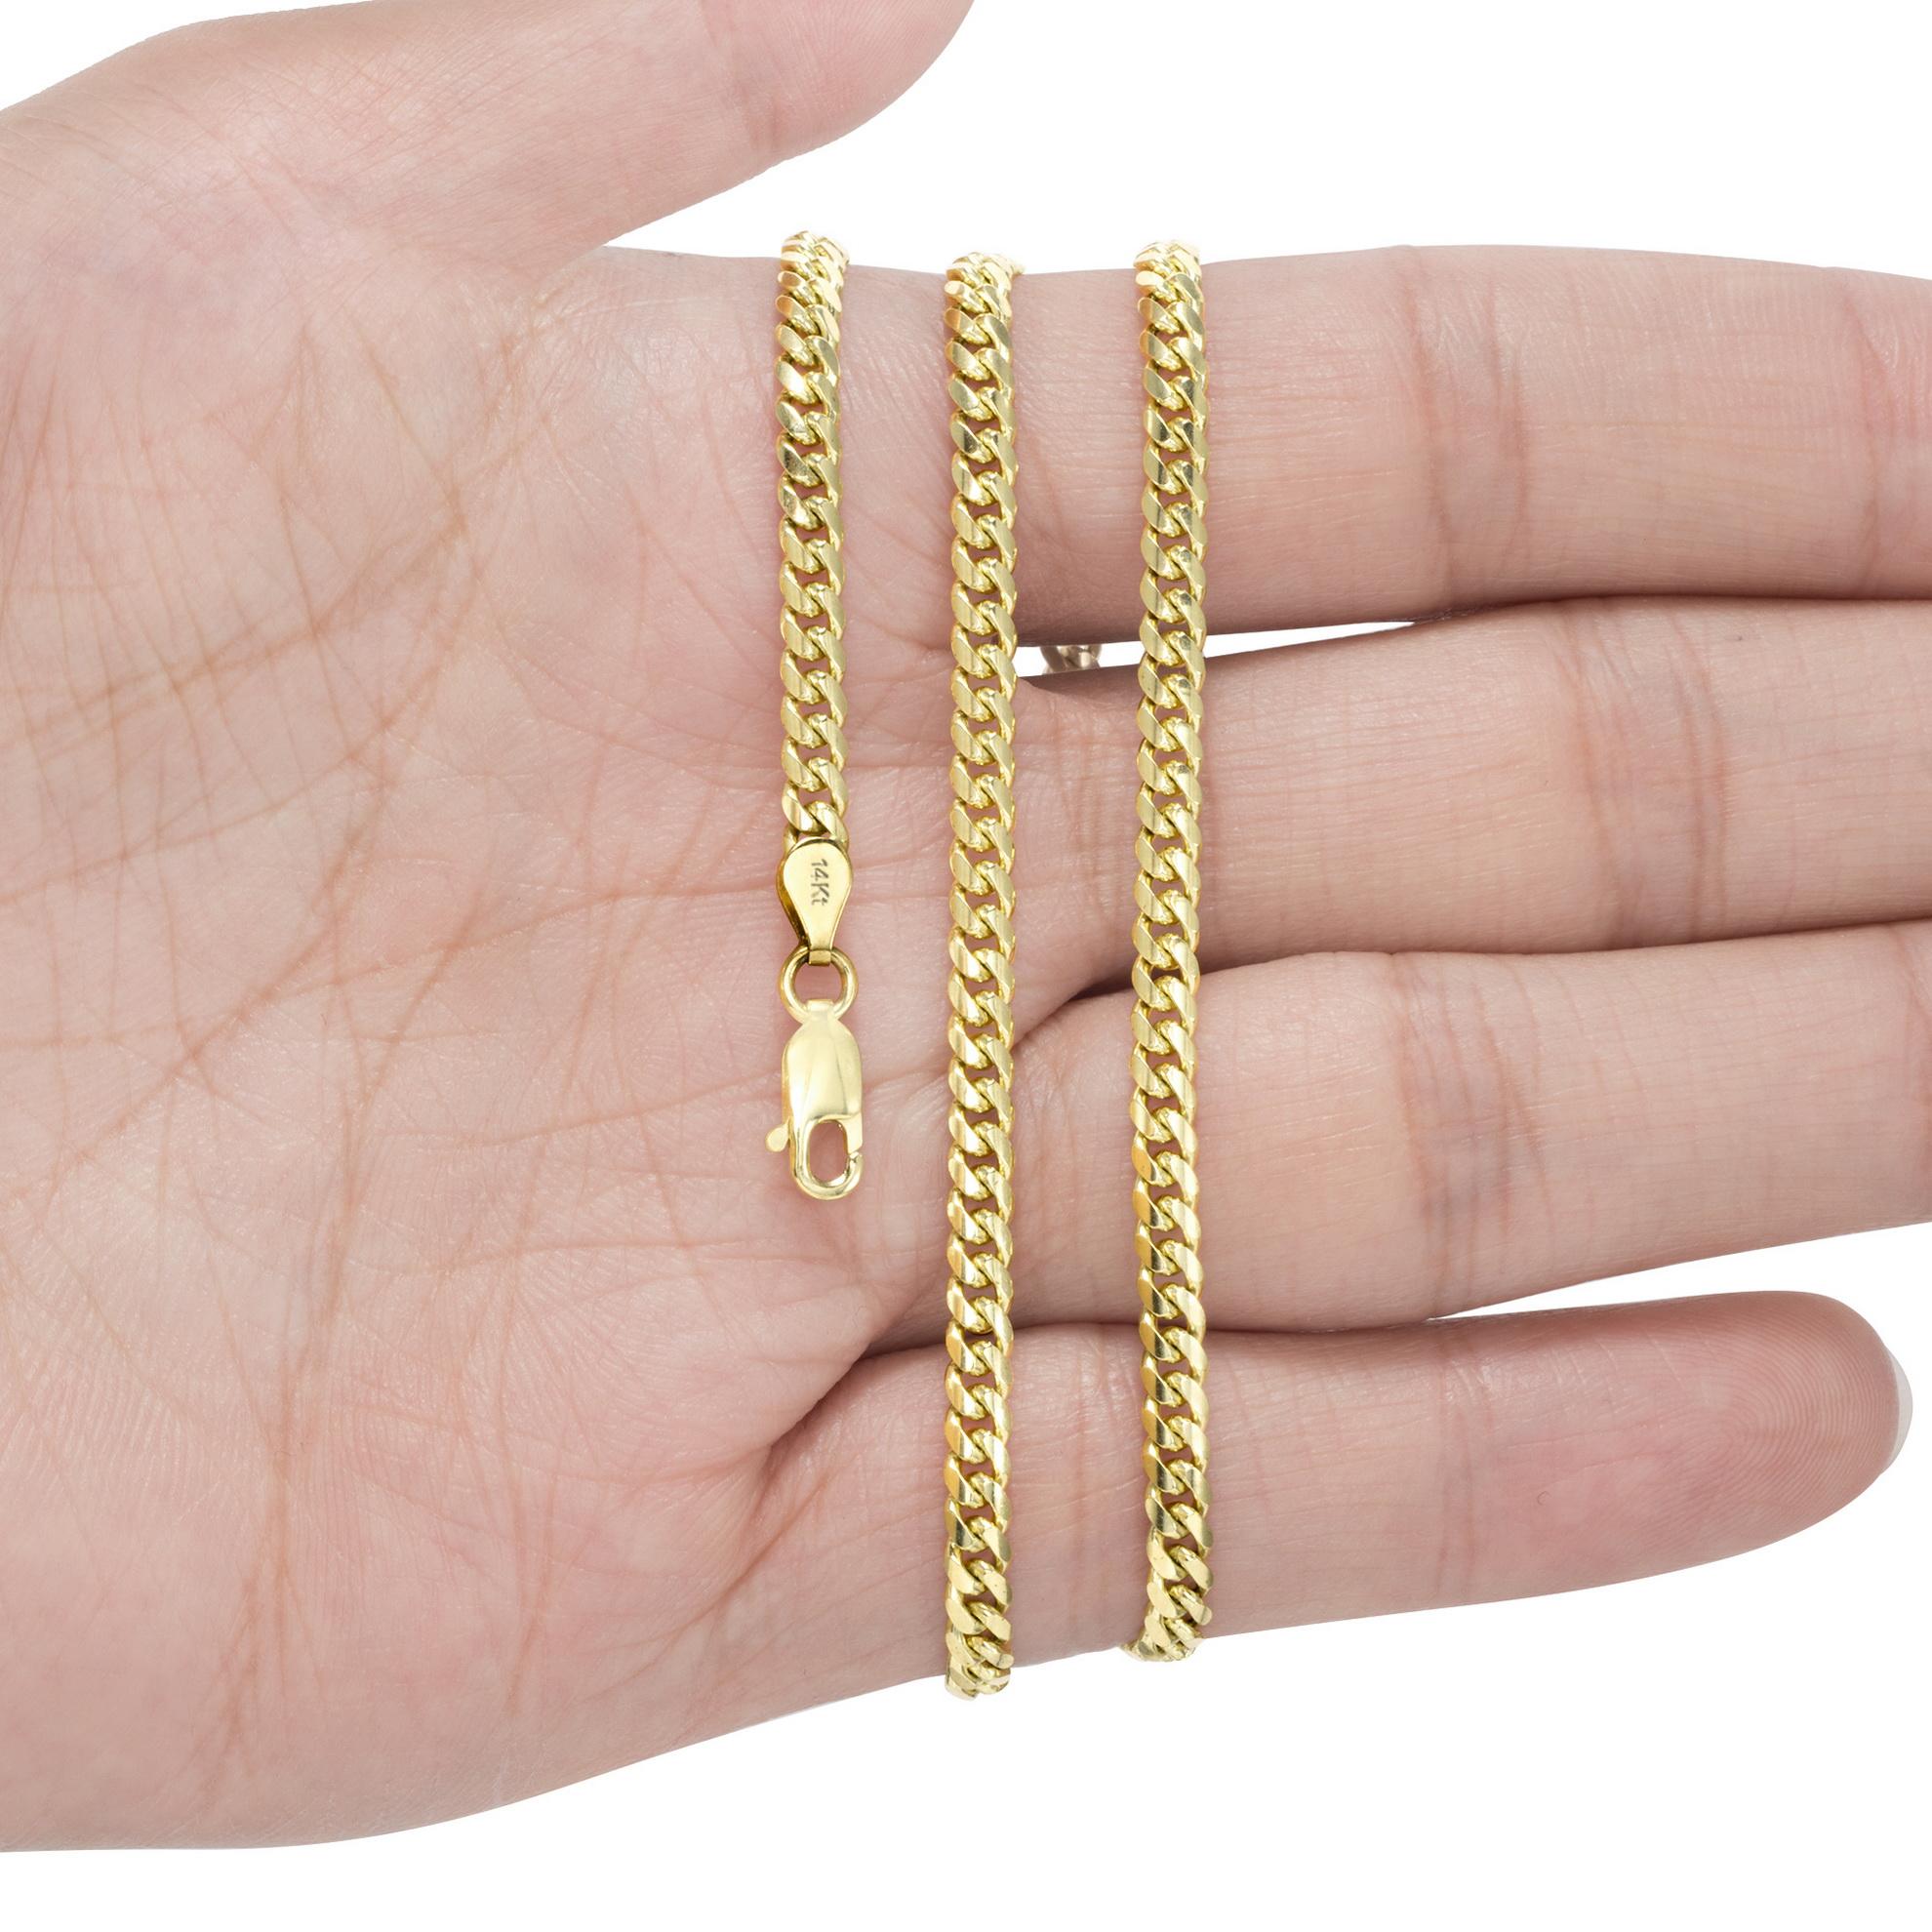 14K-Yellow-Gold-Solid-2-7mm-11mm-Miami-Cuban-Link-Chain-Bracelet-Men-Women-7-034-9-034 thumbnail 15